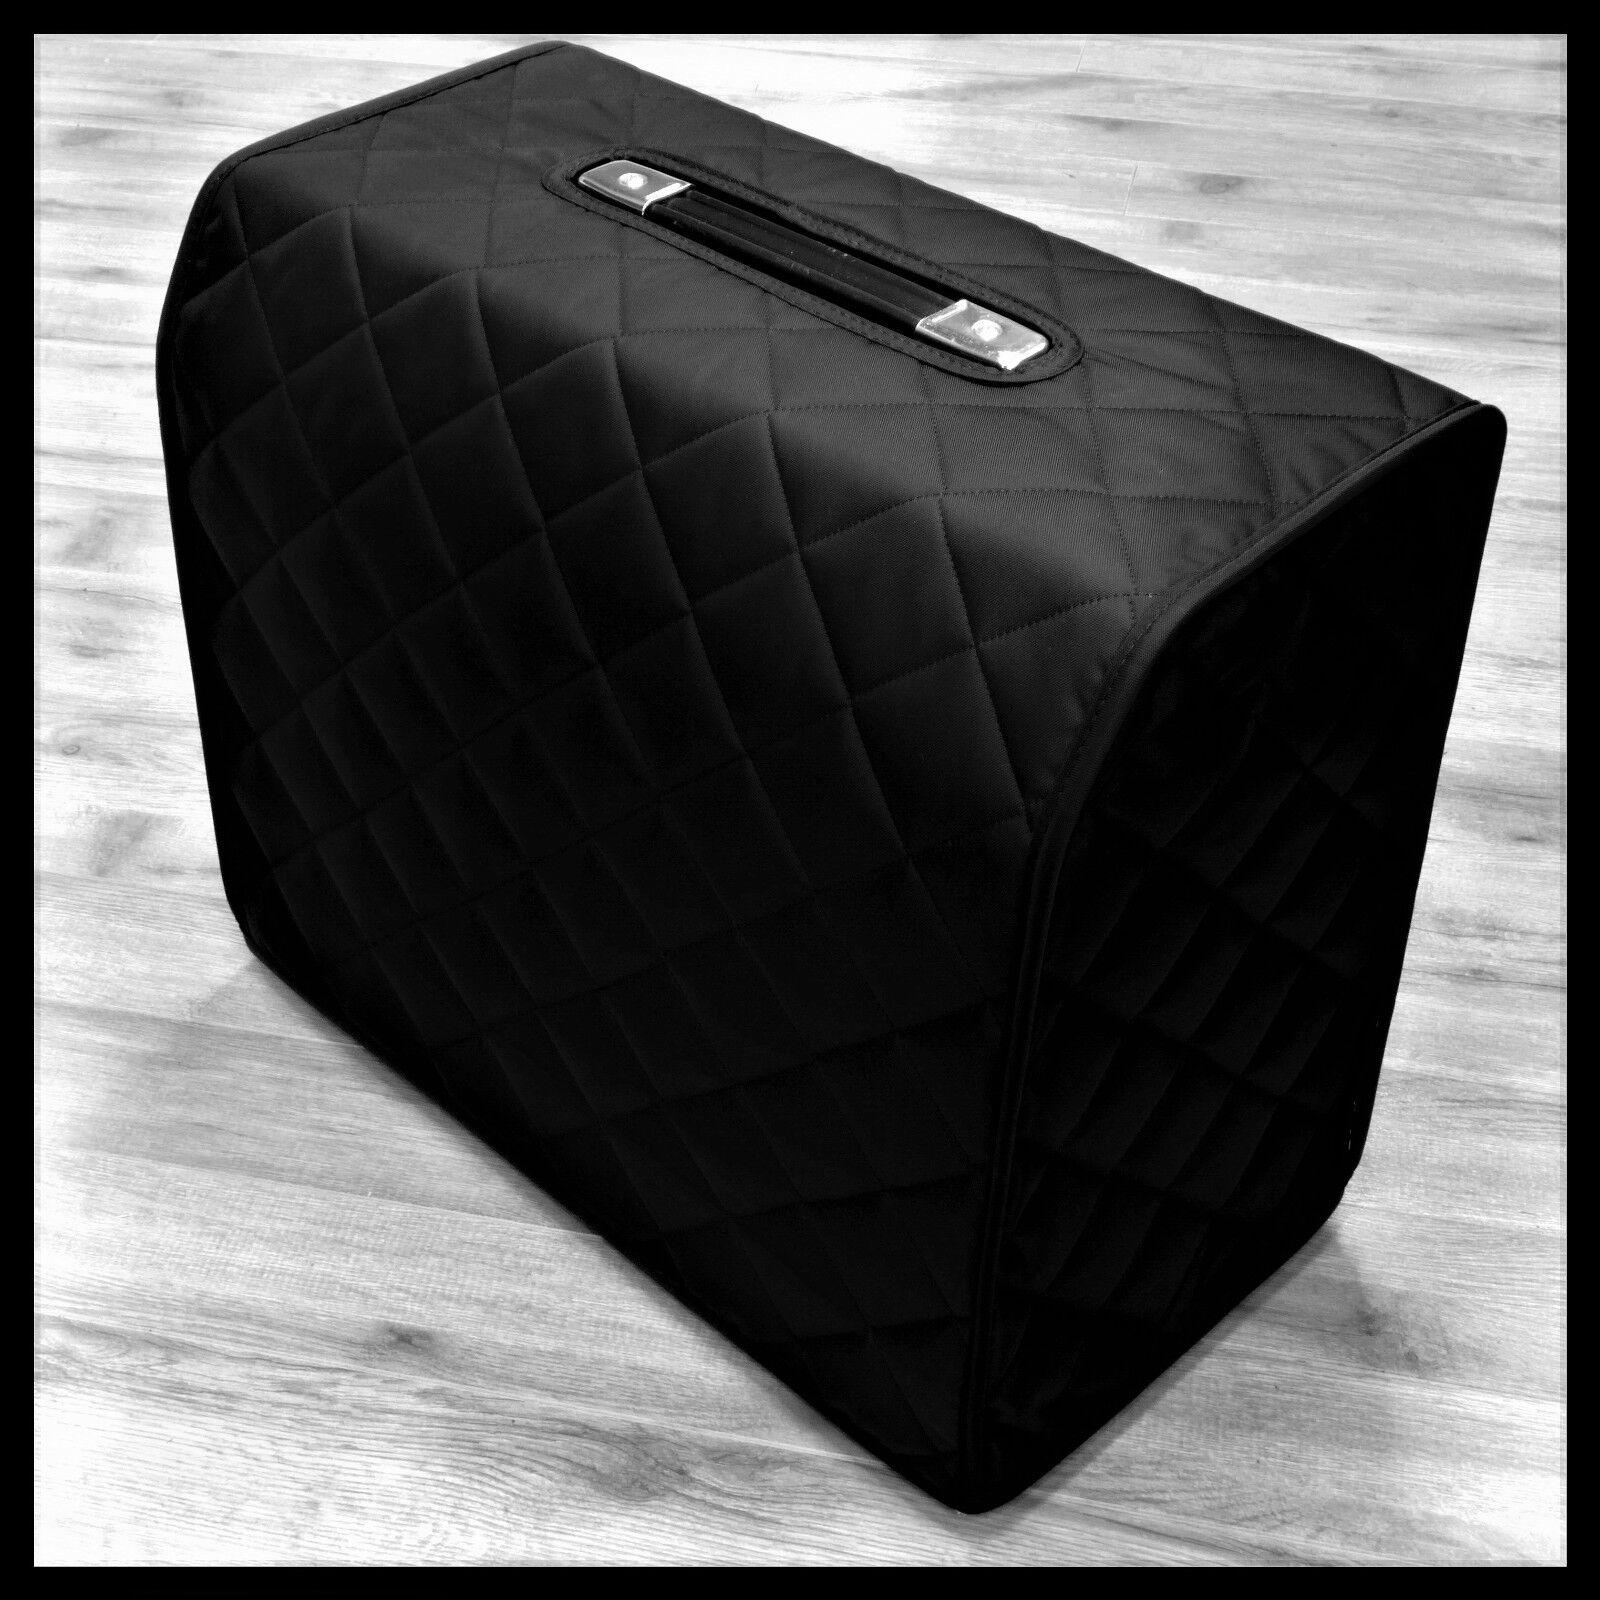 Nylongestepptes Muster Cover für LINE6 Spider Ventil 212 Combo Verstärker